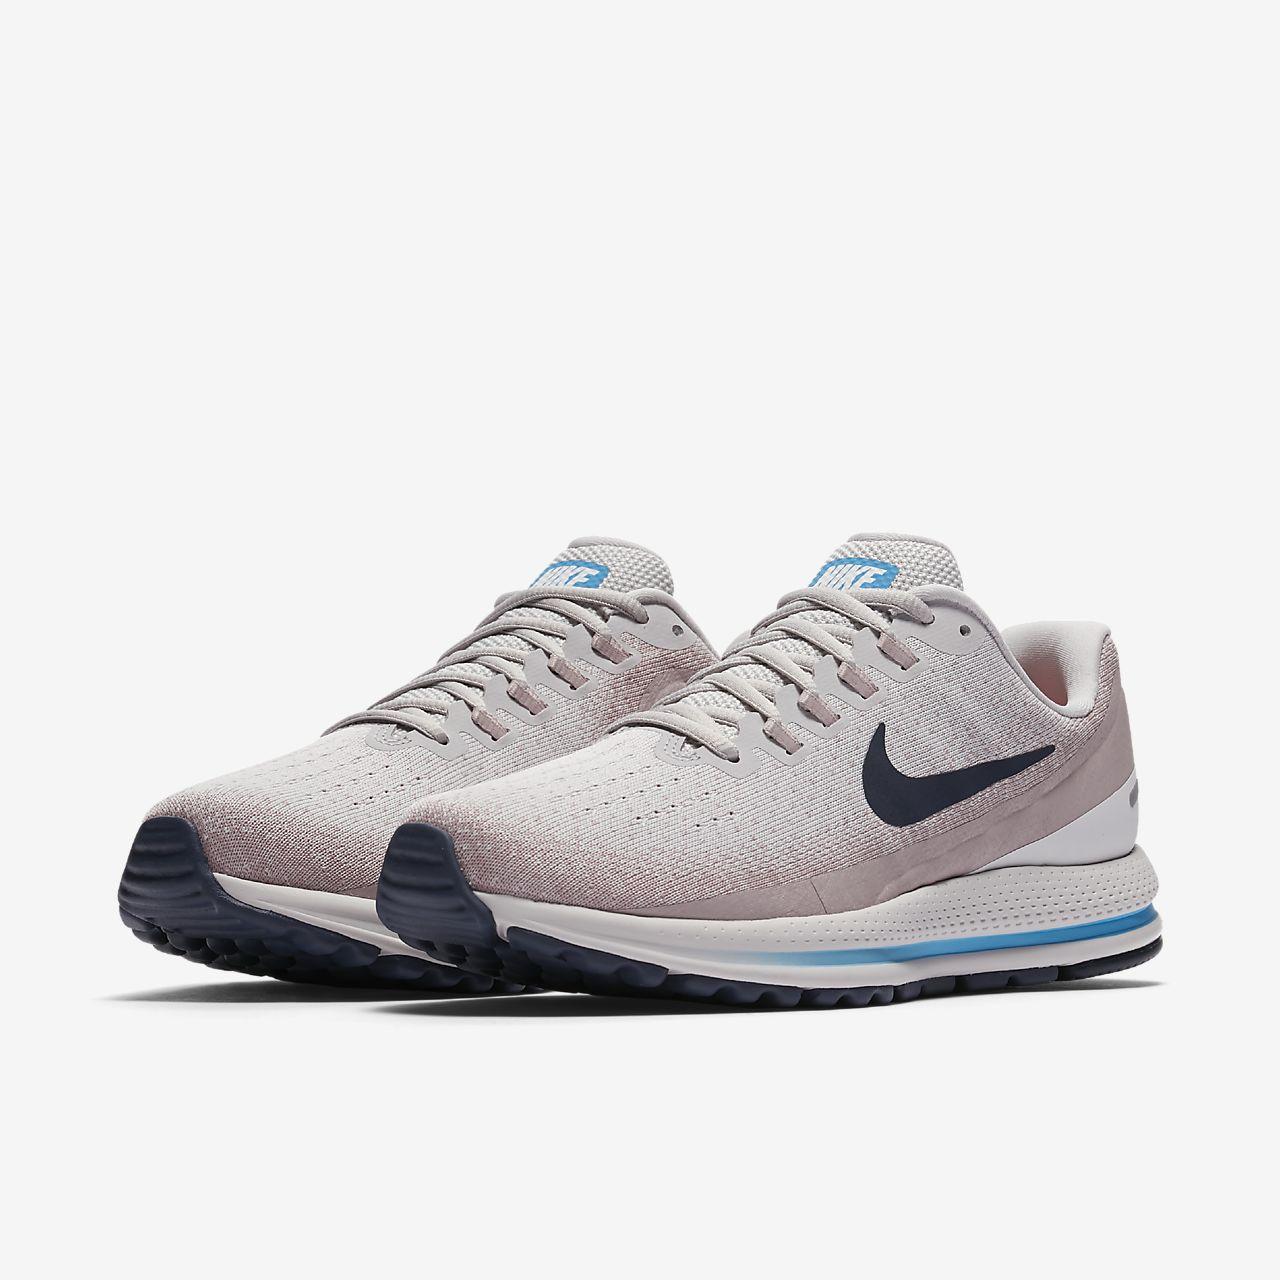 Nike Chaussures De Course Zoom Air Pegasus 35 - Rose / Gris Tonnerre Femmes Hyd3Idd